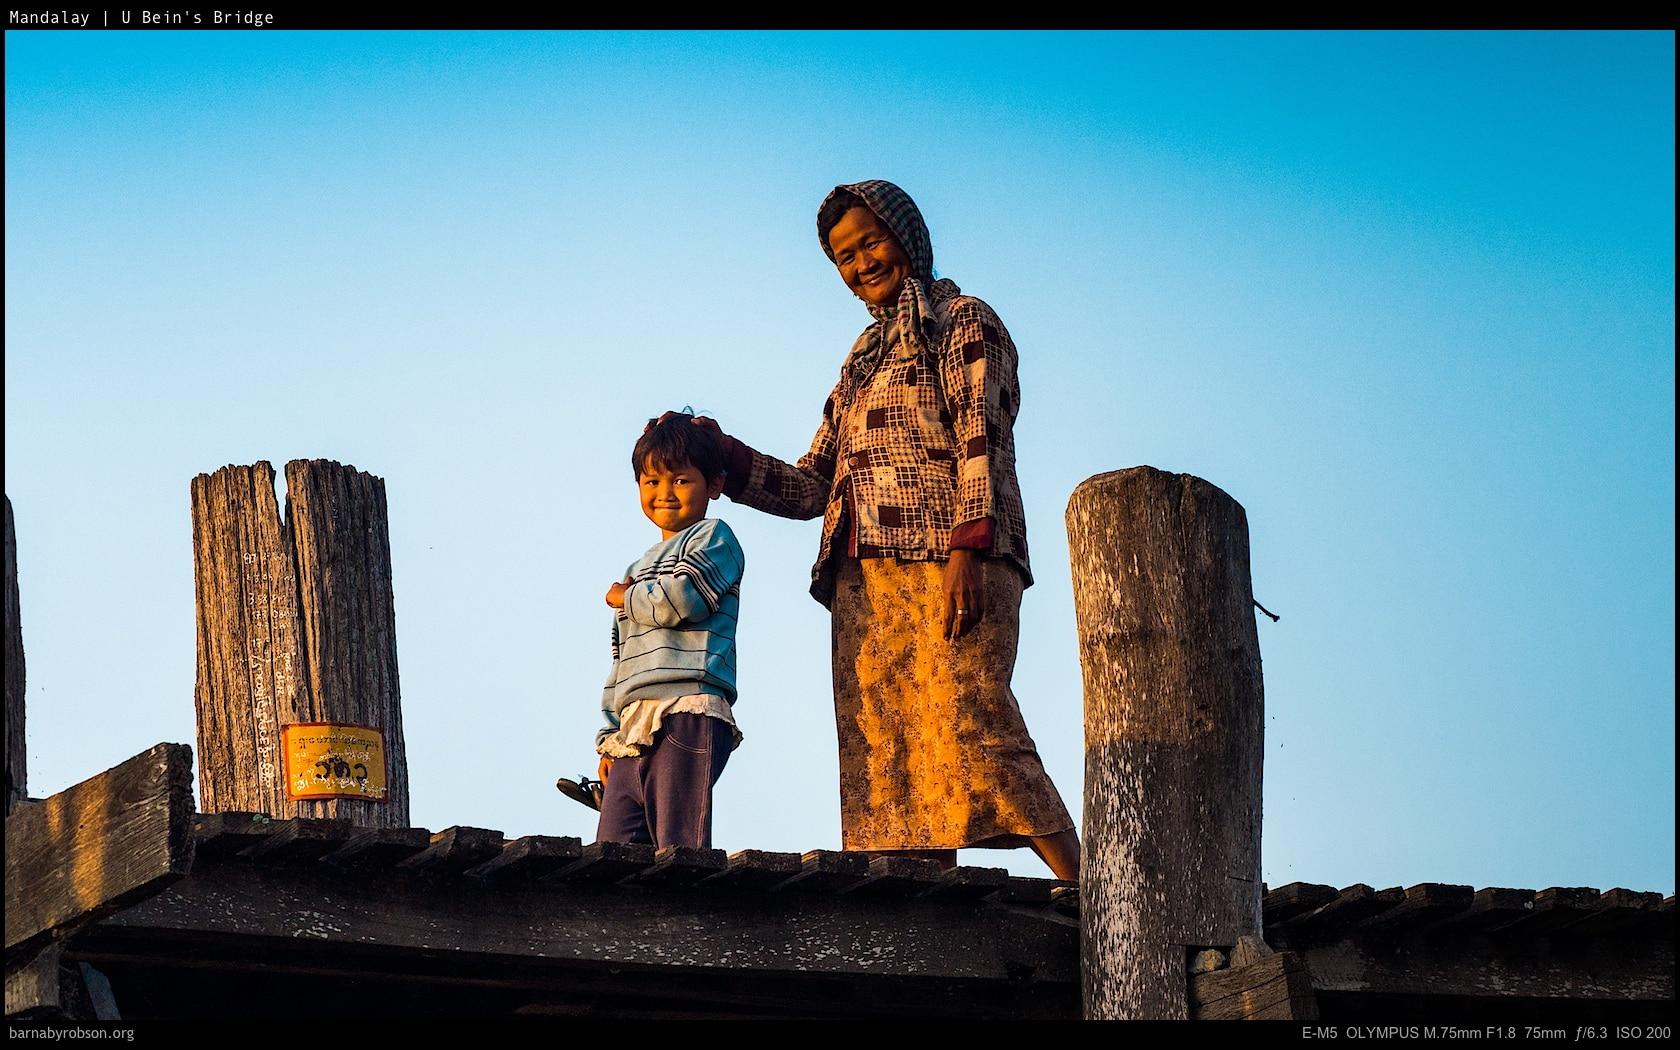 crop 1680*1050_Mandalay_ 064_